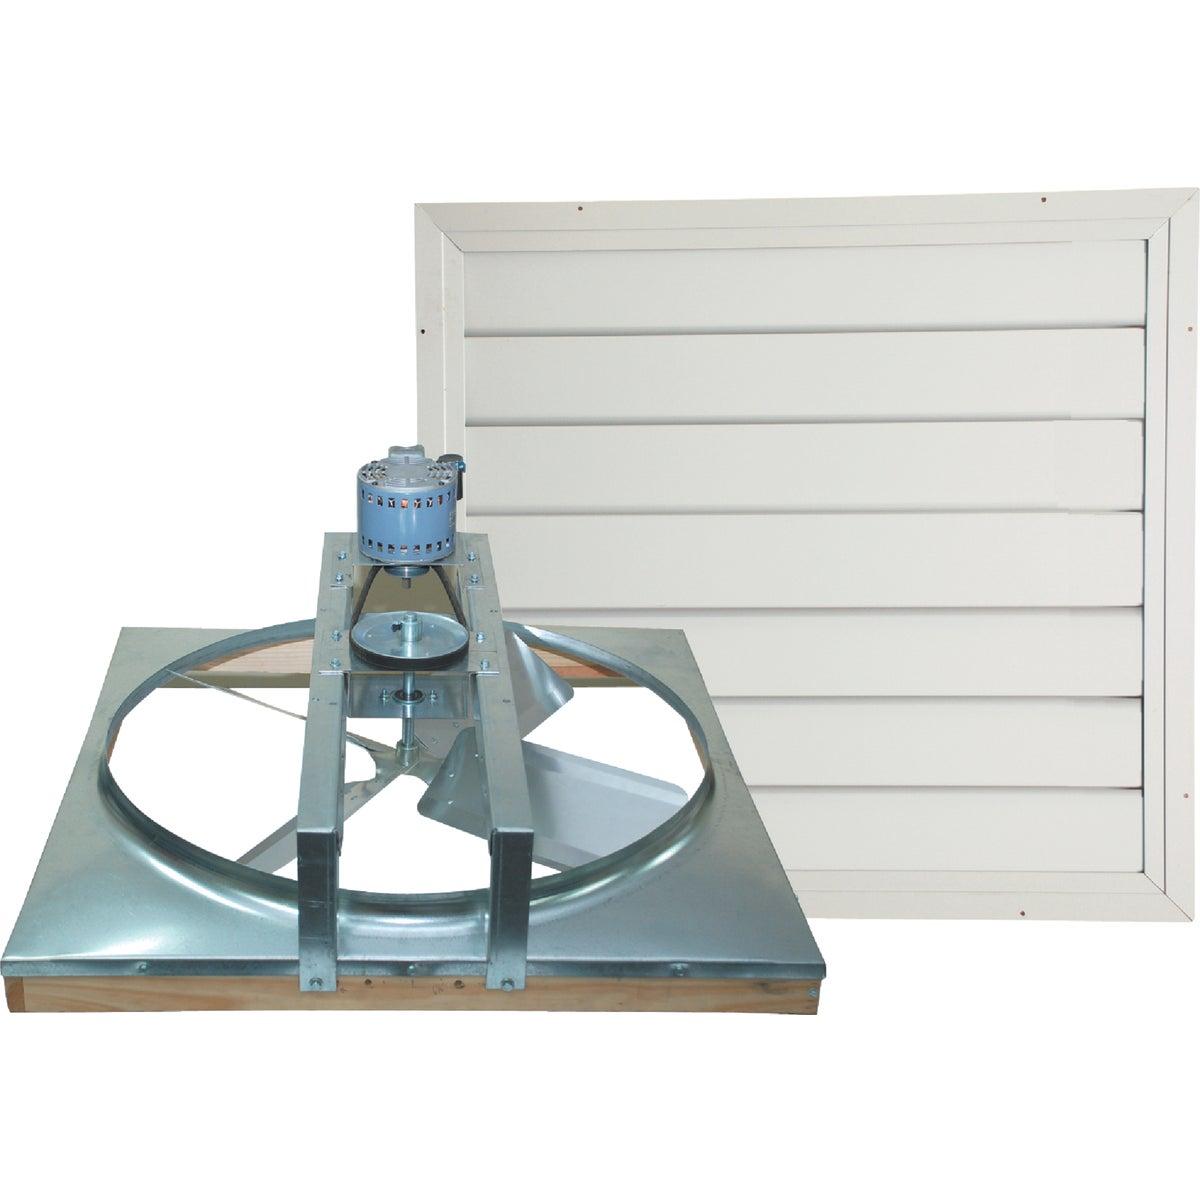 Ventamatic Belt Drive Whole House Fan With Automatic Shutter, CX36BD2SPD